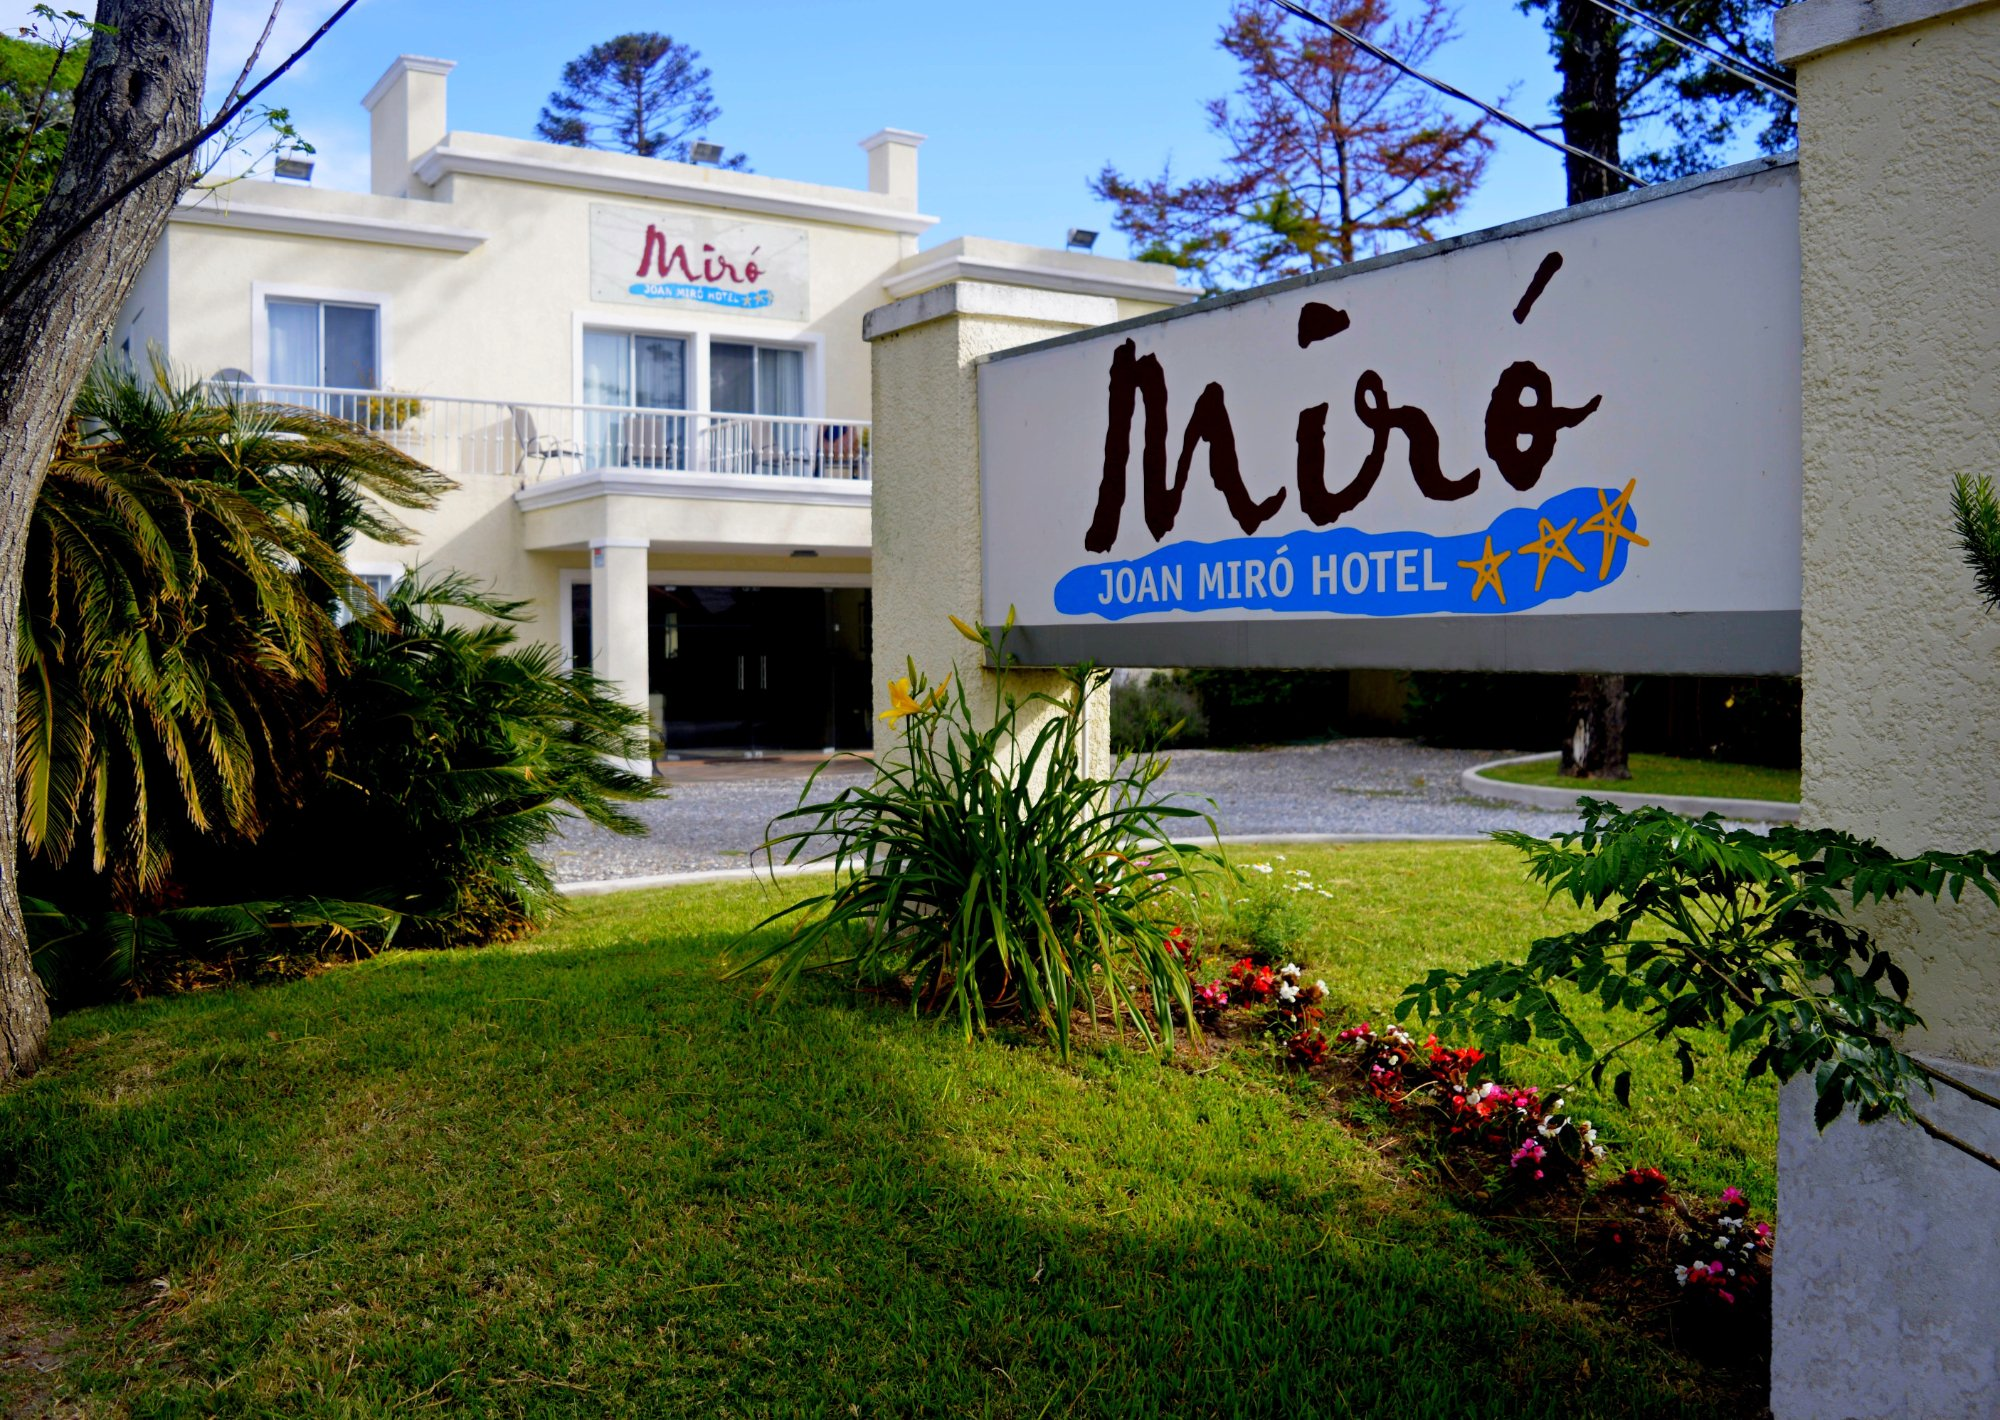 Joan Miro Hotel